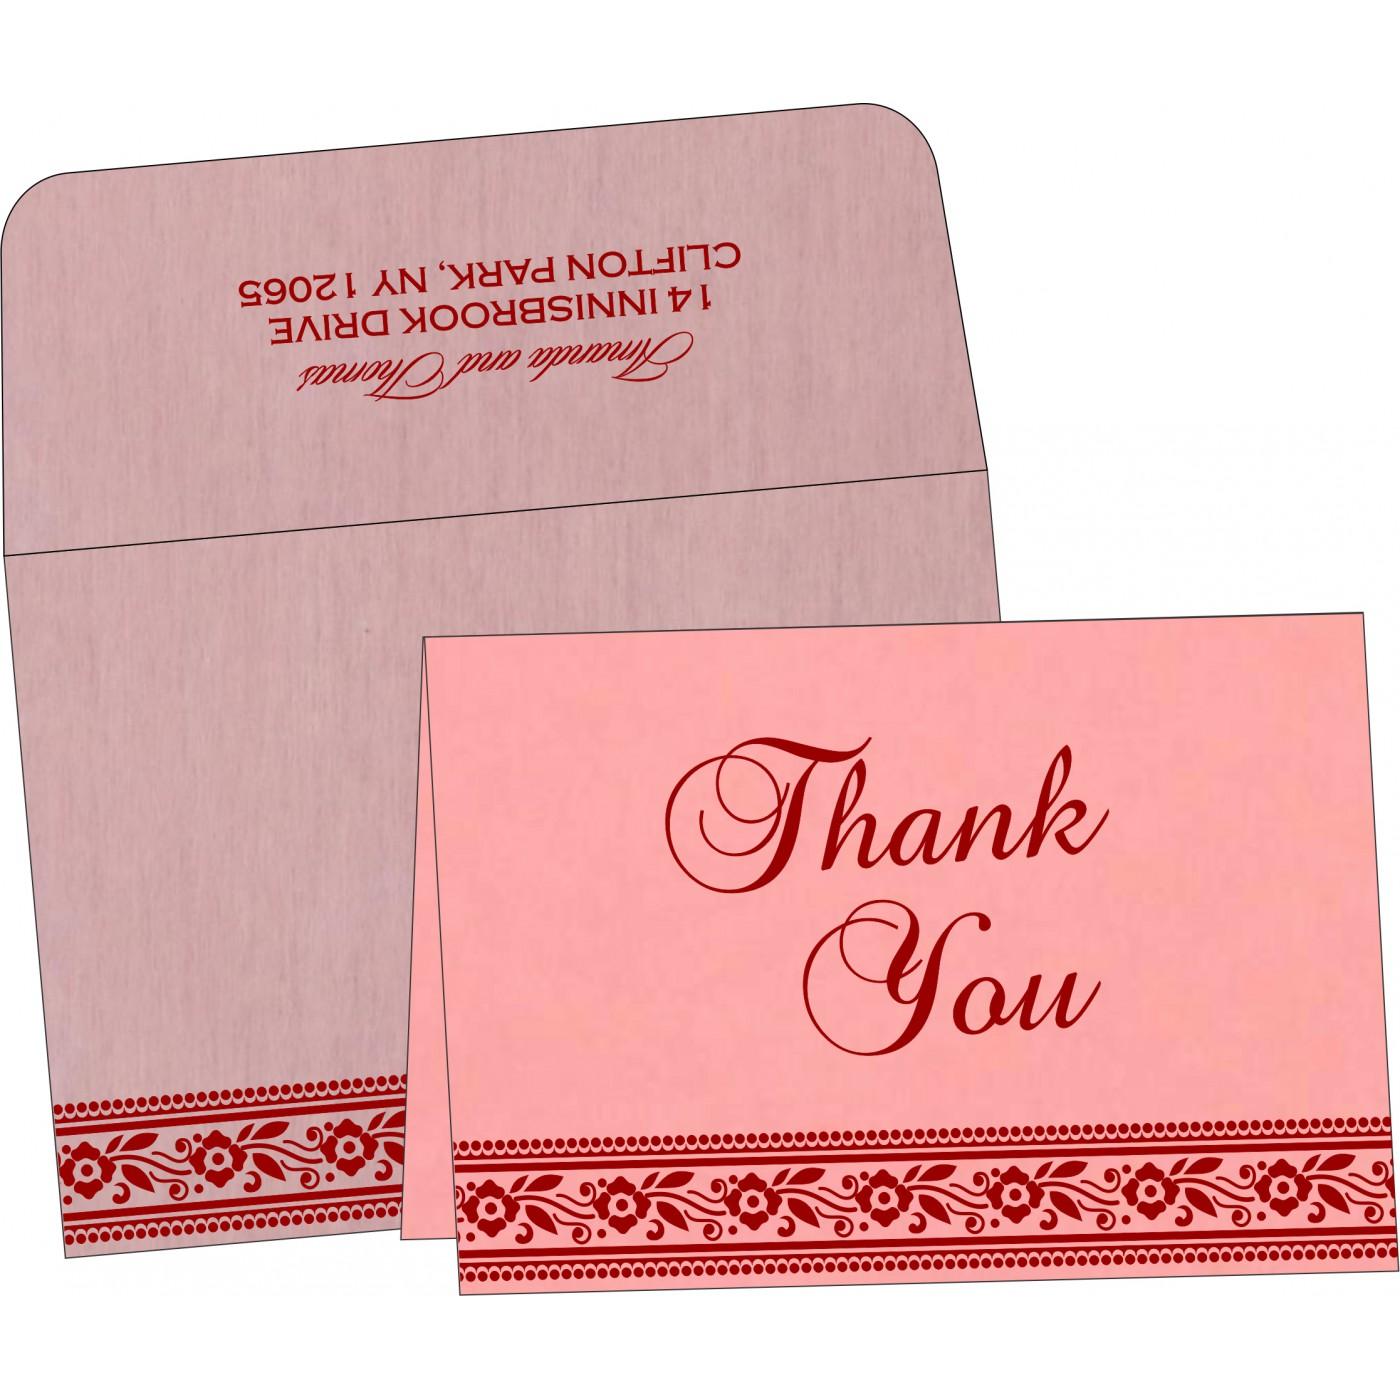 Thank You Cards : CTYC-8220J - IndianWeddingCards